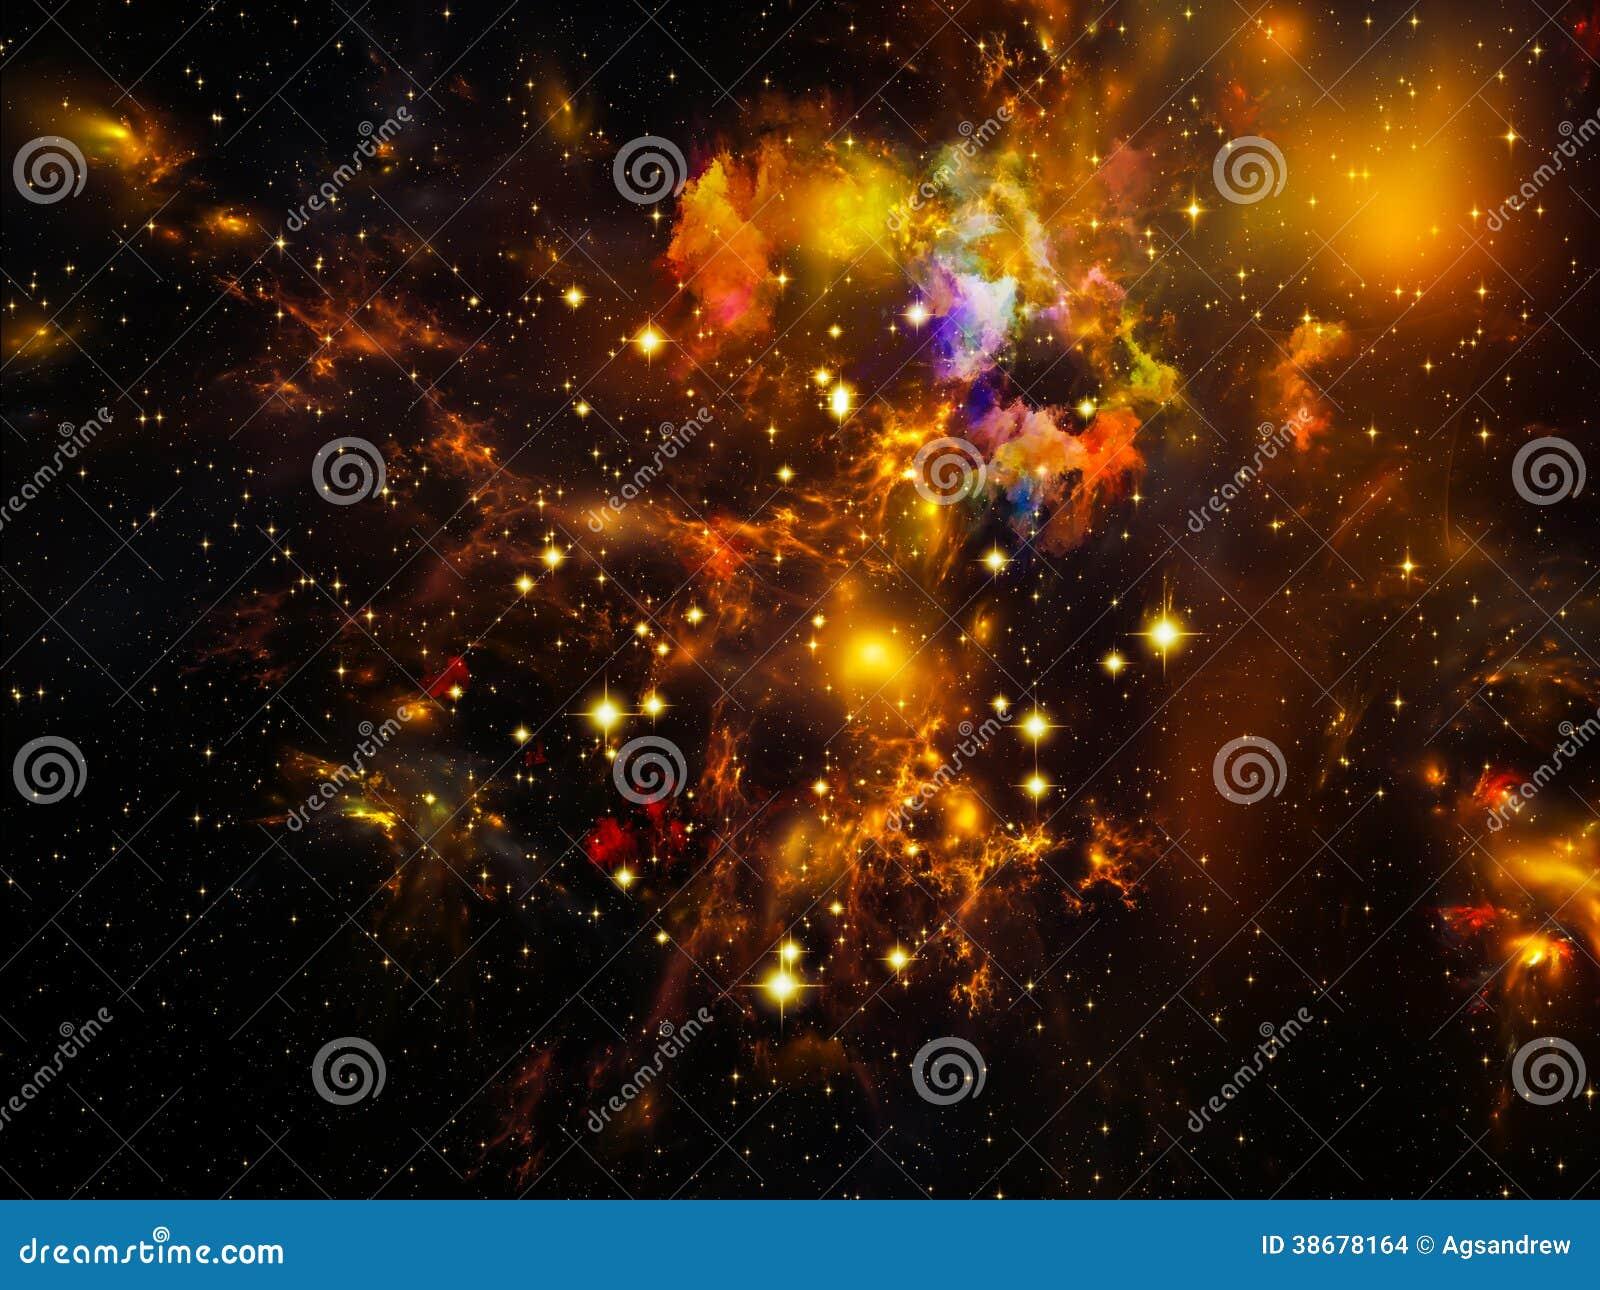 Stock Images Fractal Nebula Universe Not Enough Series Composition Ele...